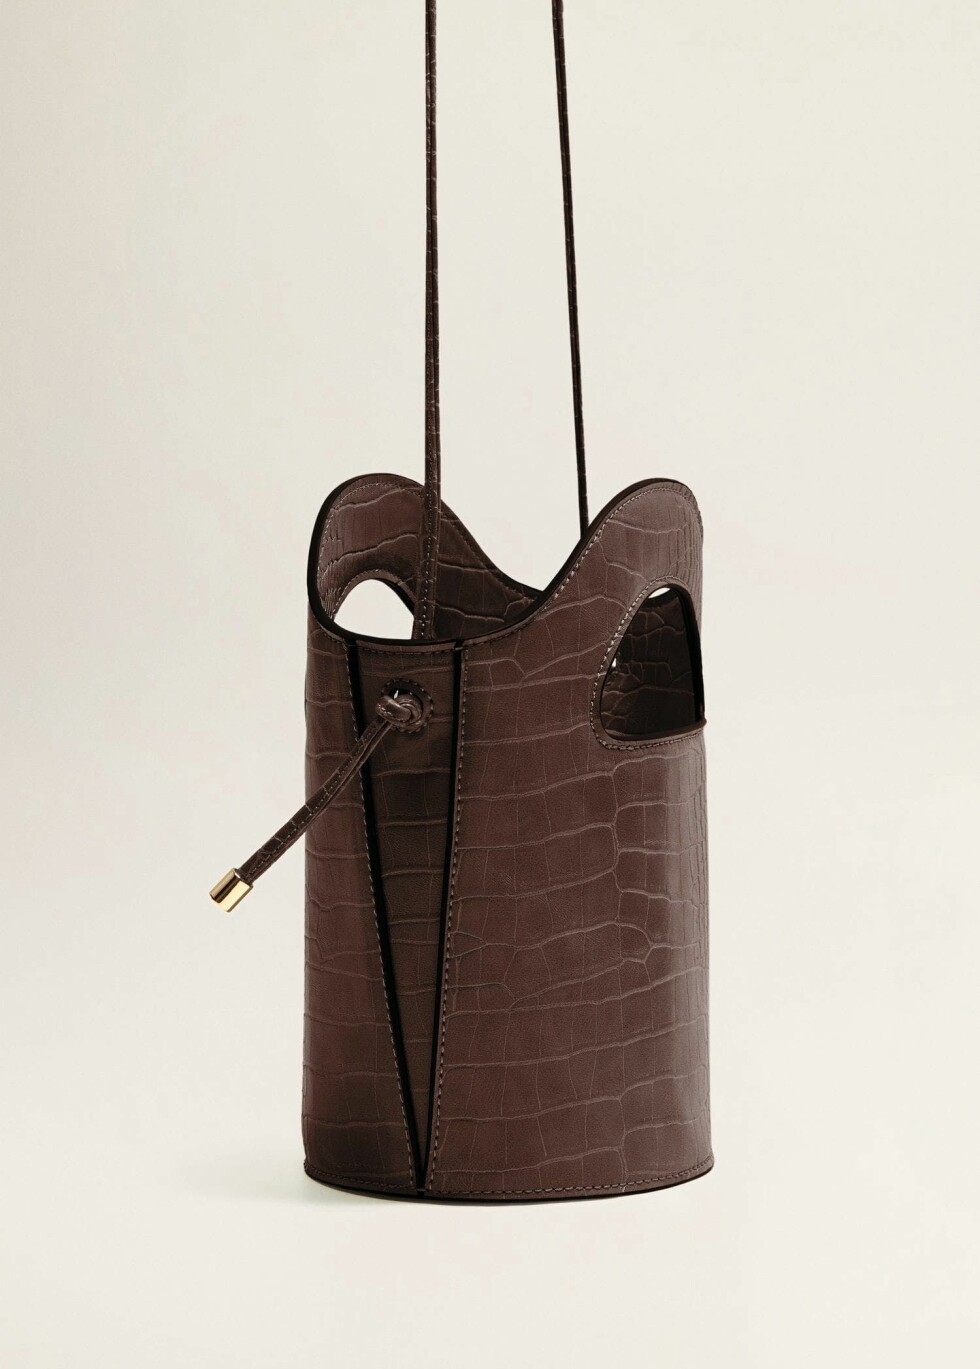 Veske fra Mango |129,-| https://shop.mango.com/no-en/women/bags-handbags/croc-effect-tote-bag_33031050.html?c=78&n=1&s=Rebajas_she.accesorio;40,340,440